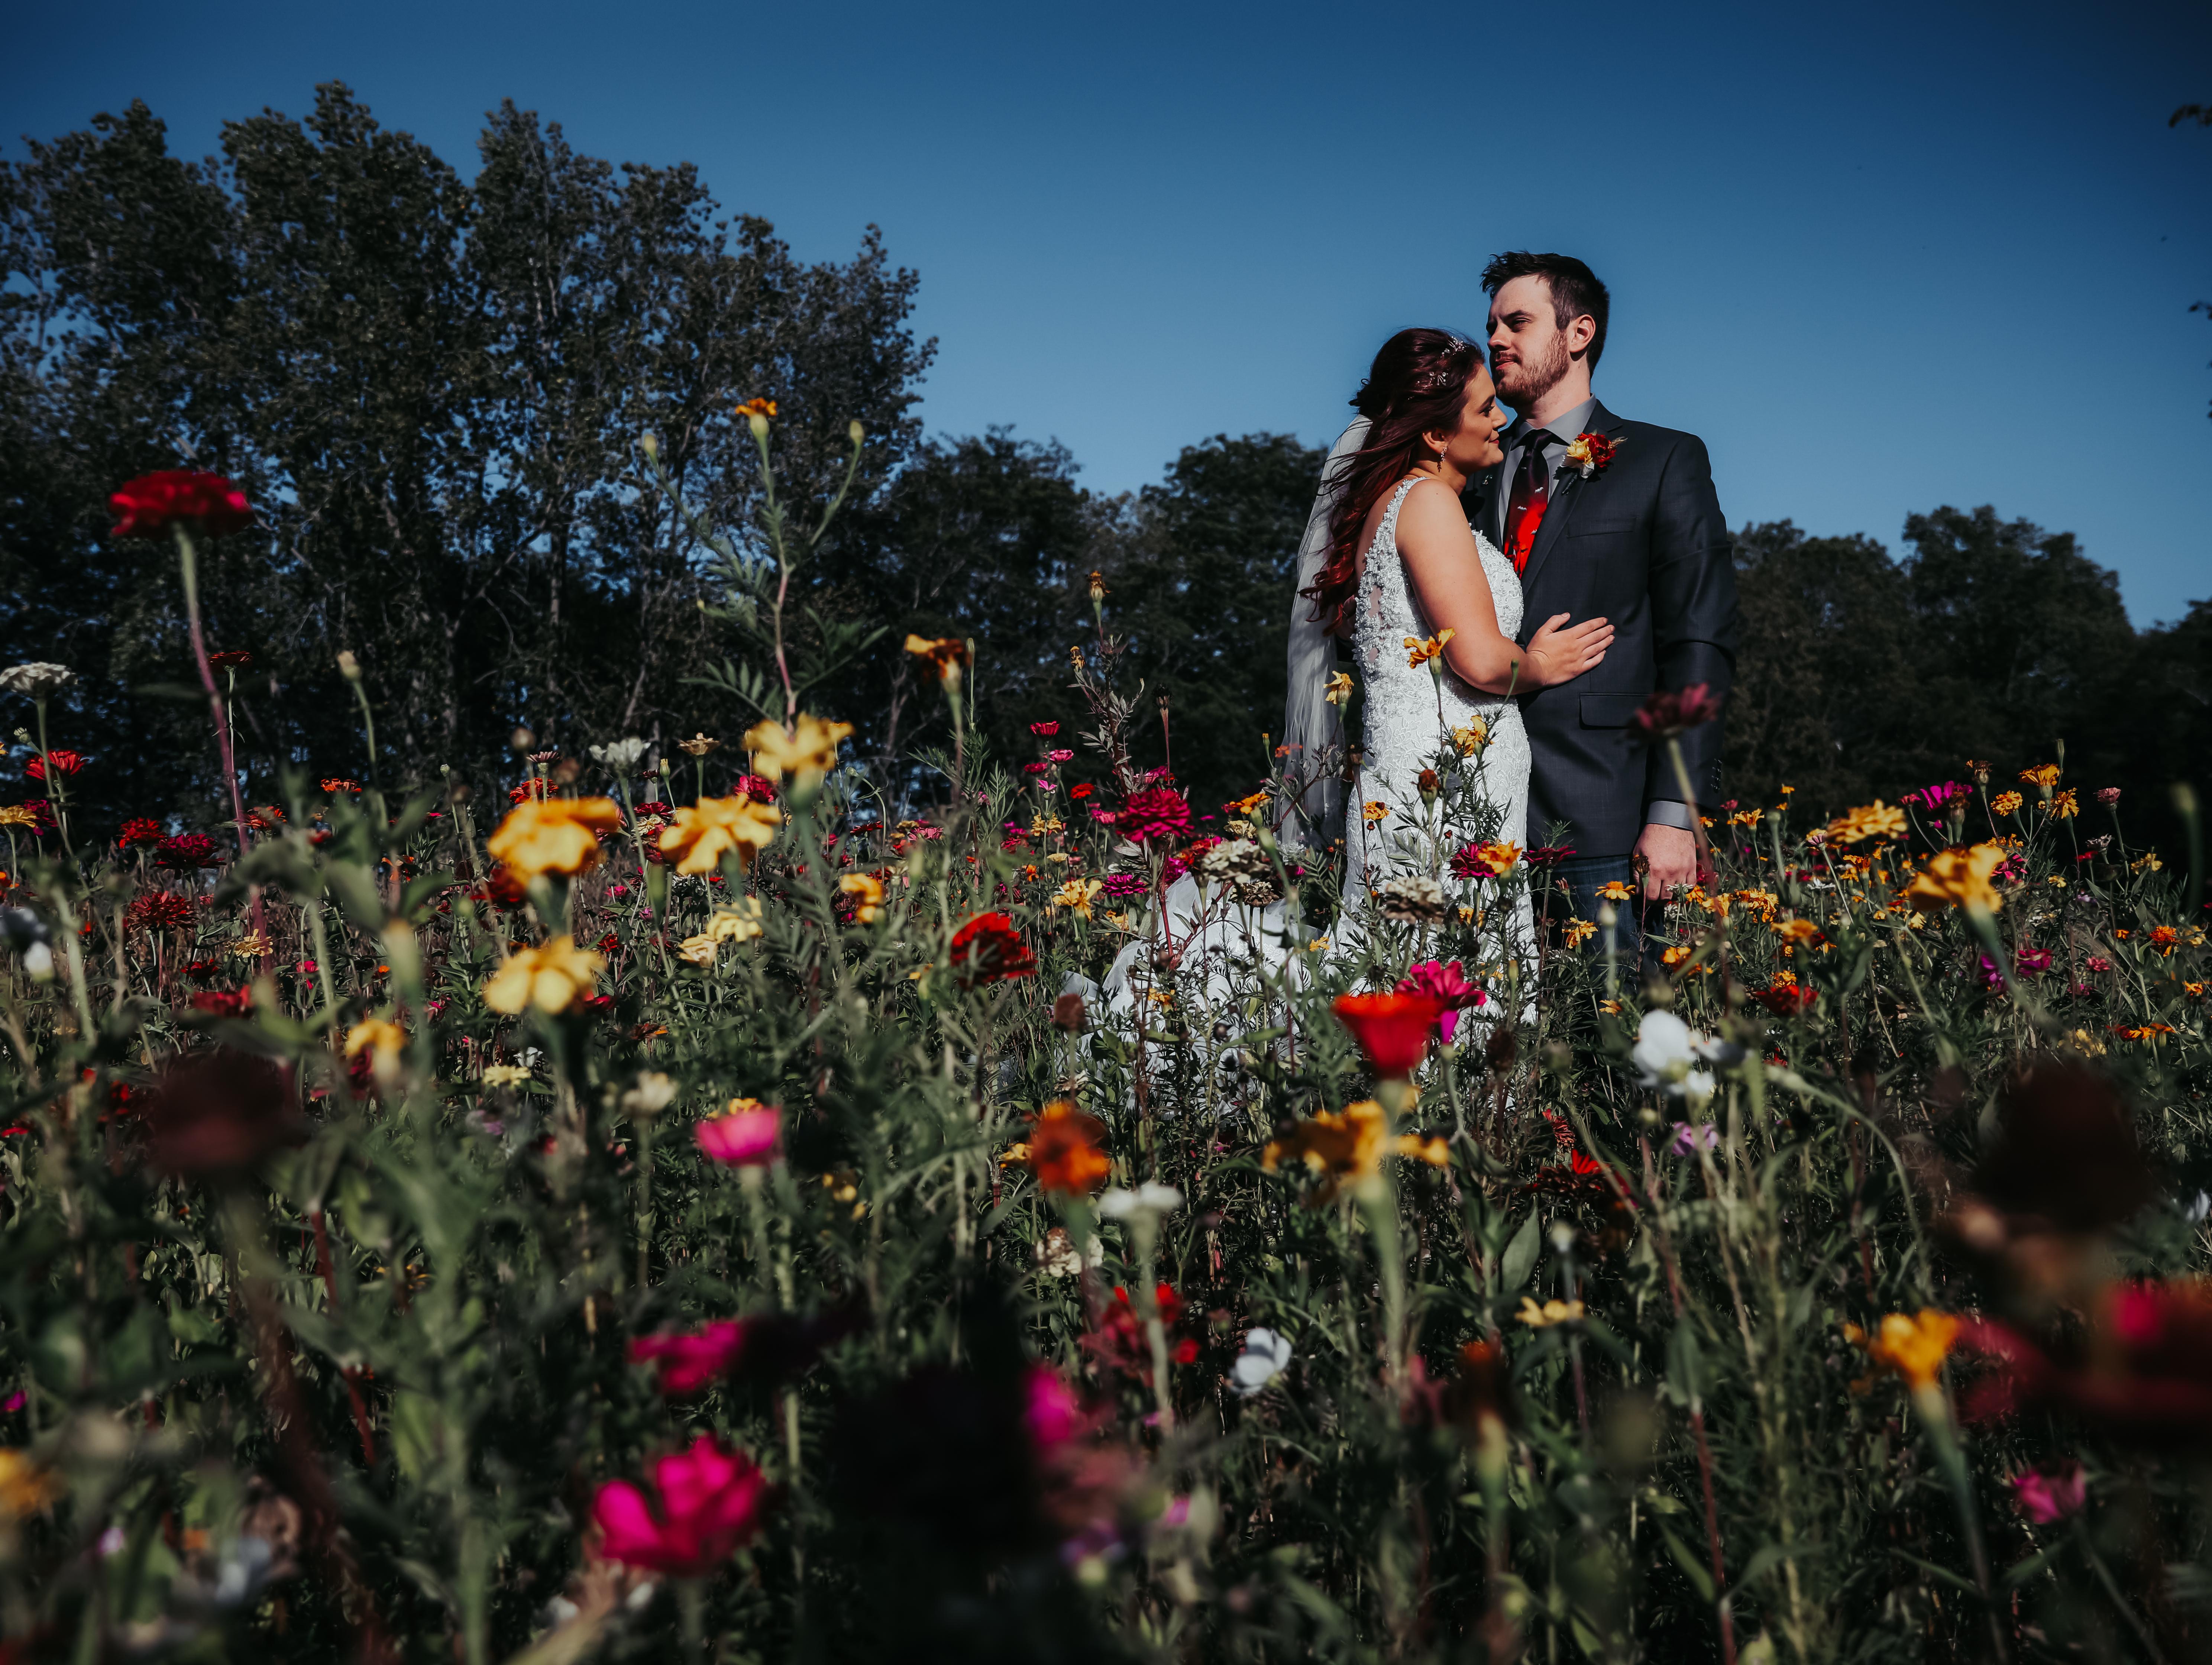 Illinois Farmstead Wedding in Wildflowers